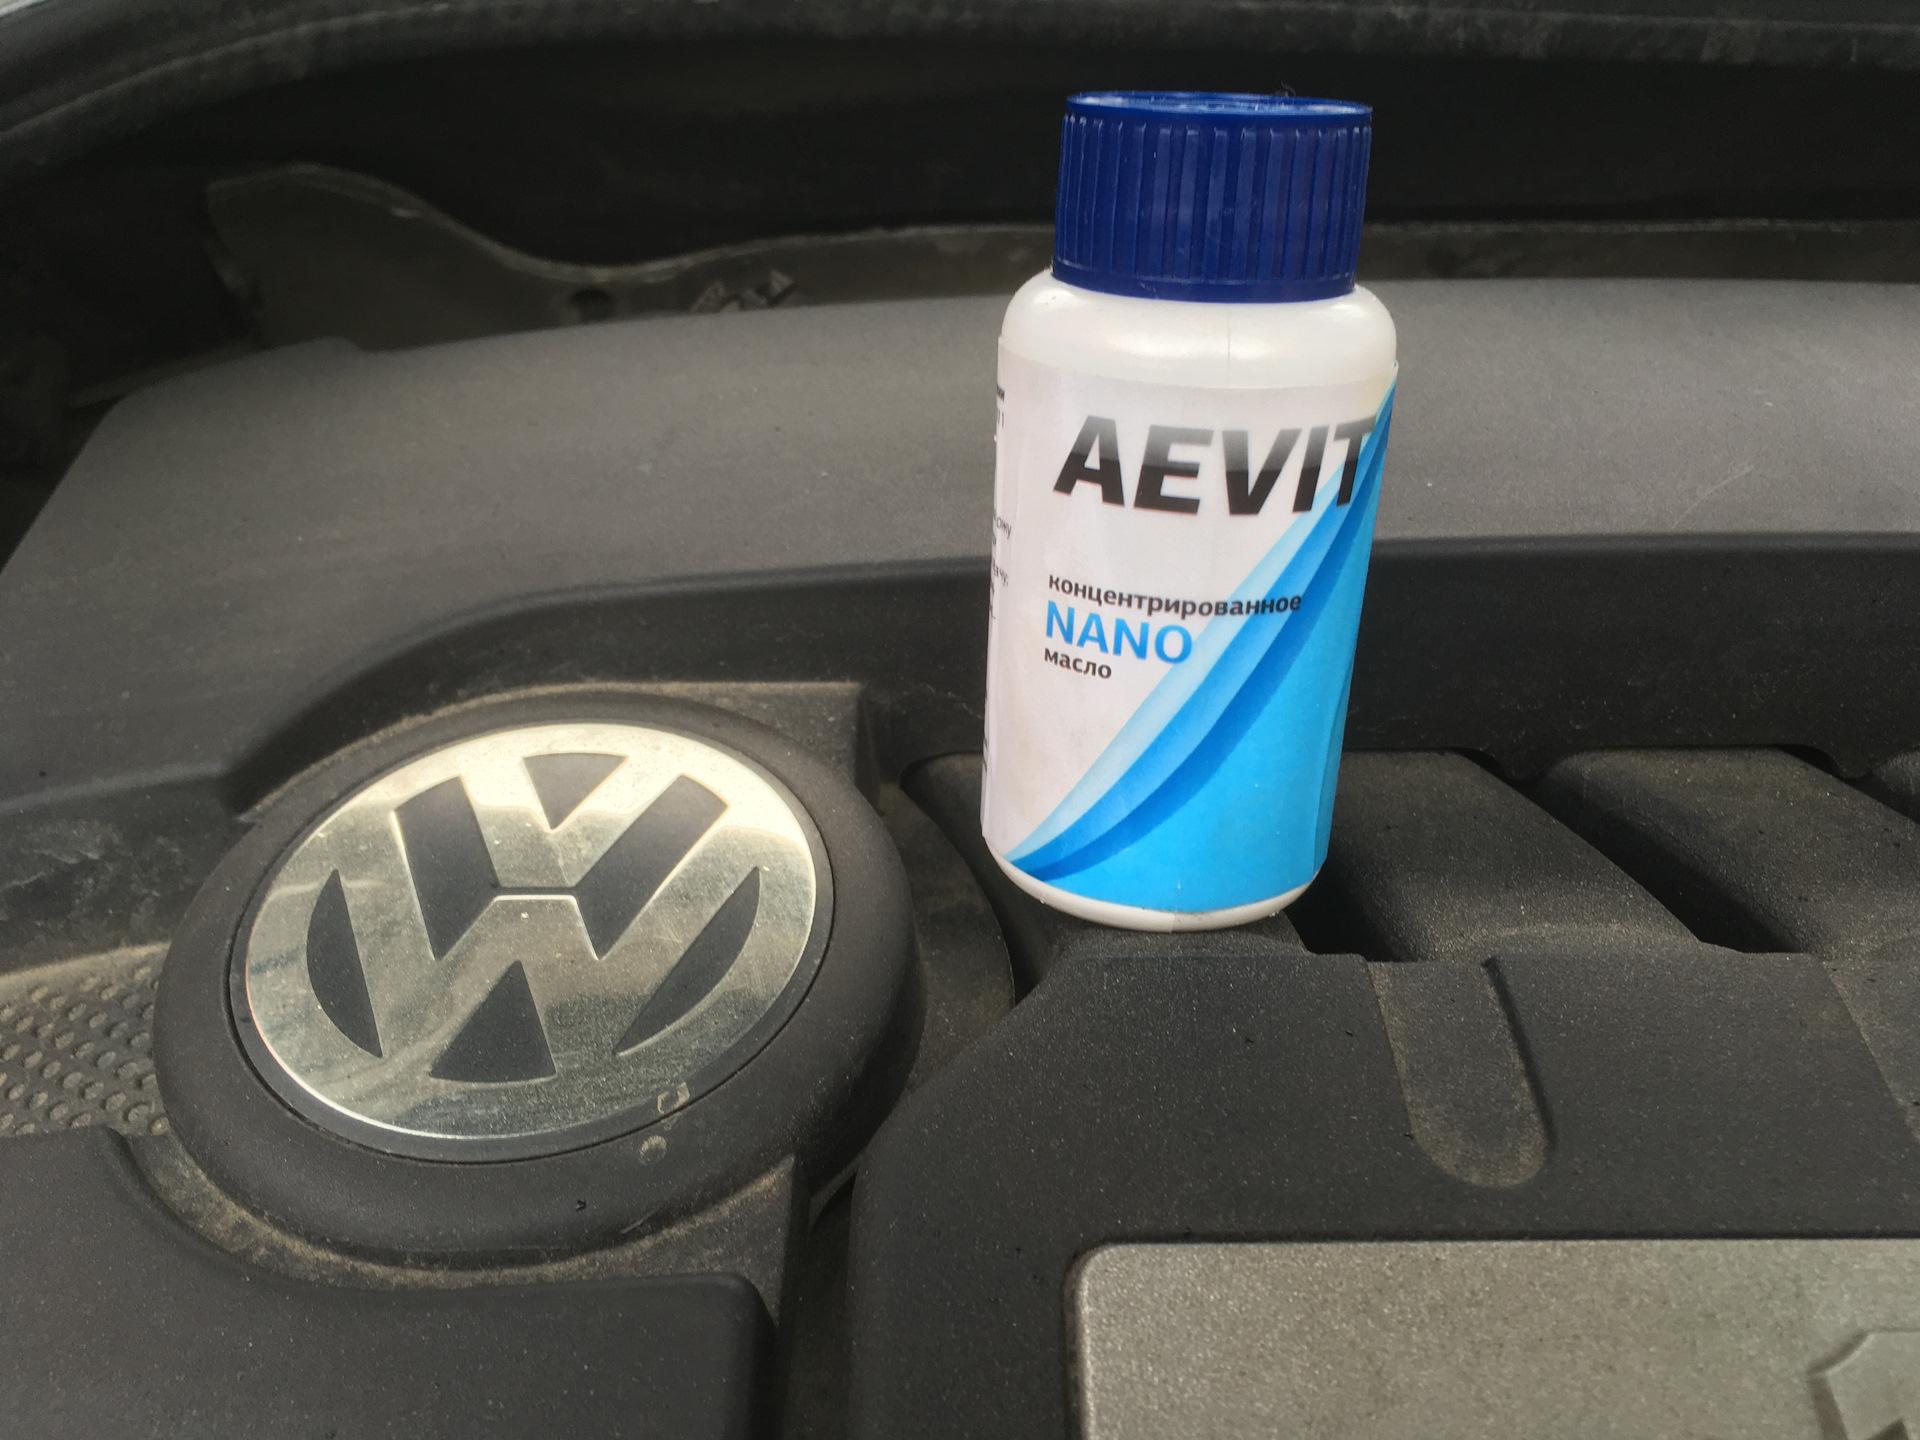 How to take Aevit